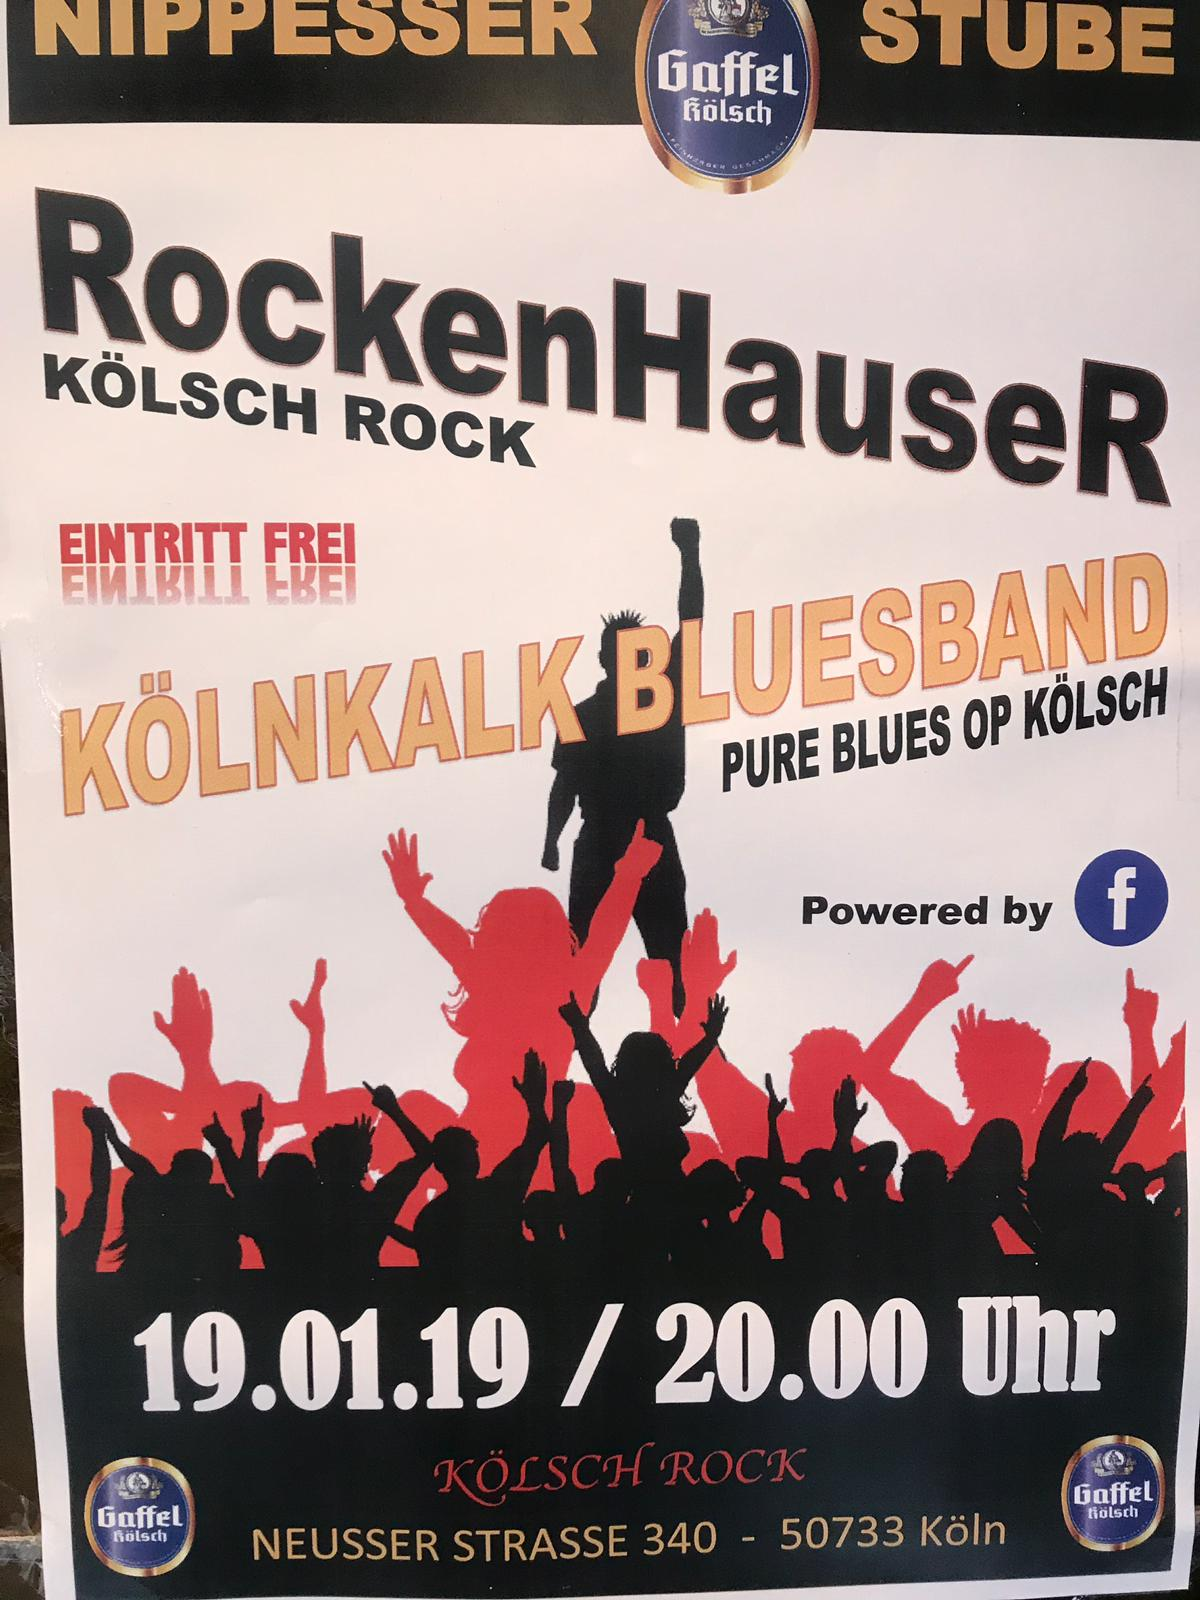 Rocken-Hauser-Koelsch-Koeln-Kalk-Blues-Band-190119